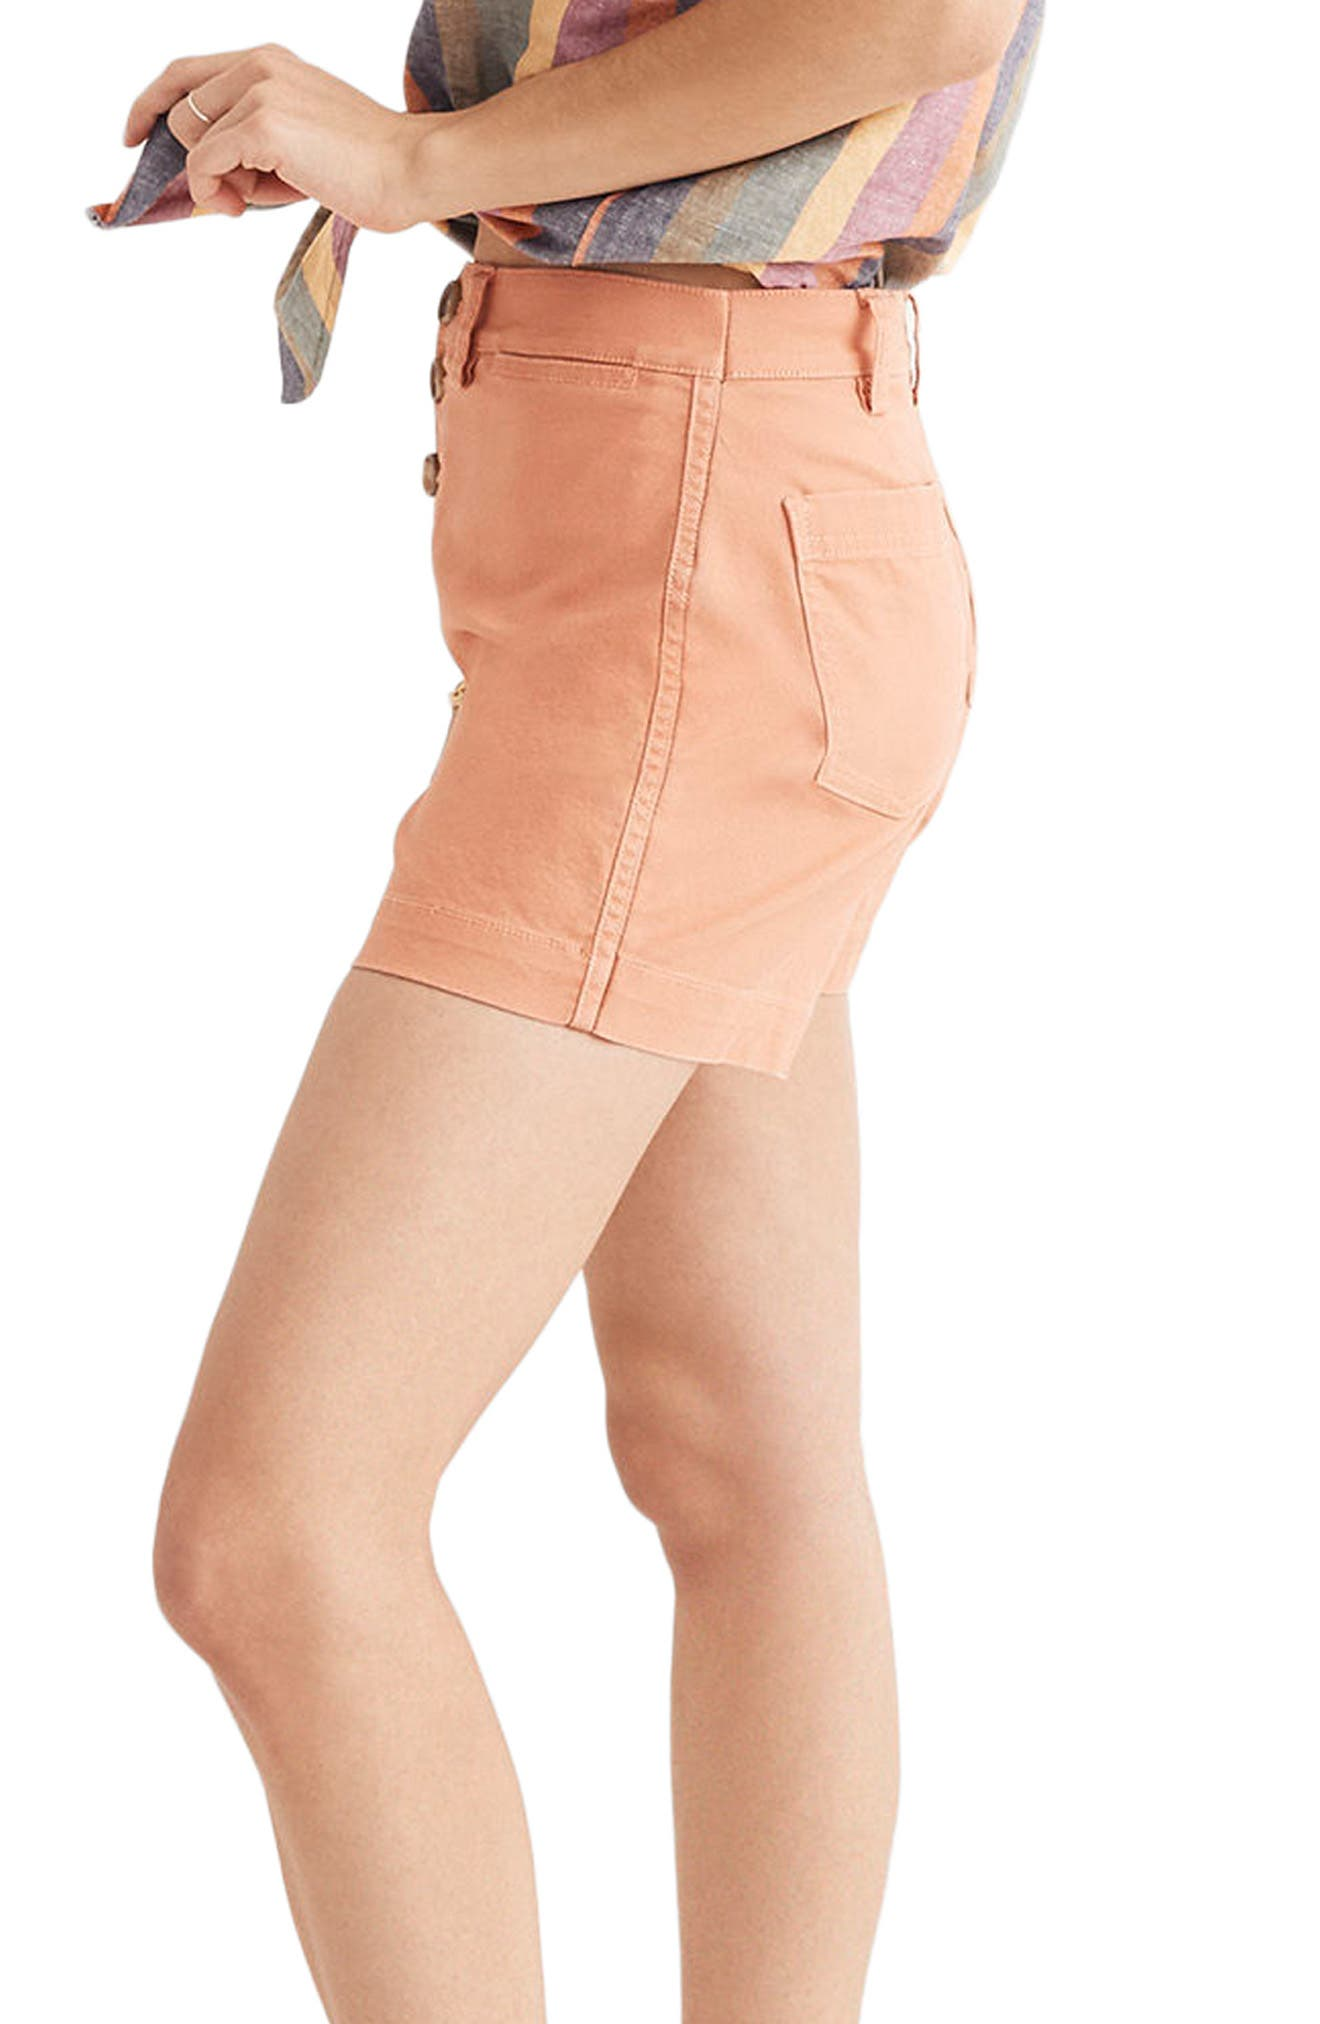 Emmett Button Front Shorts,                             Alternate thumbnail 3, color,                             Dried Coral